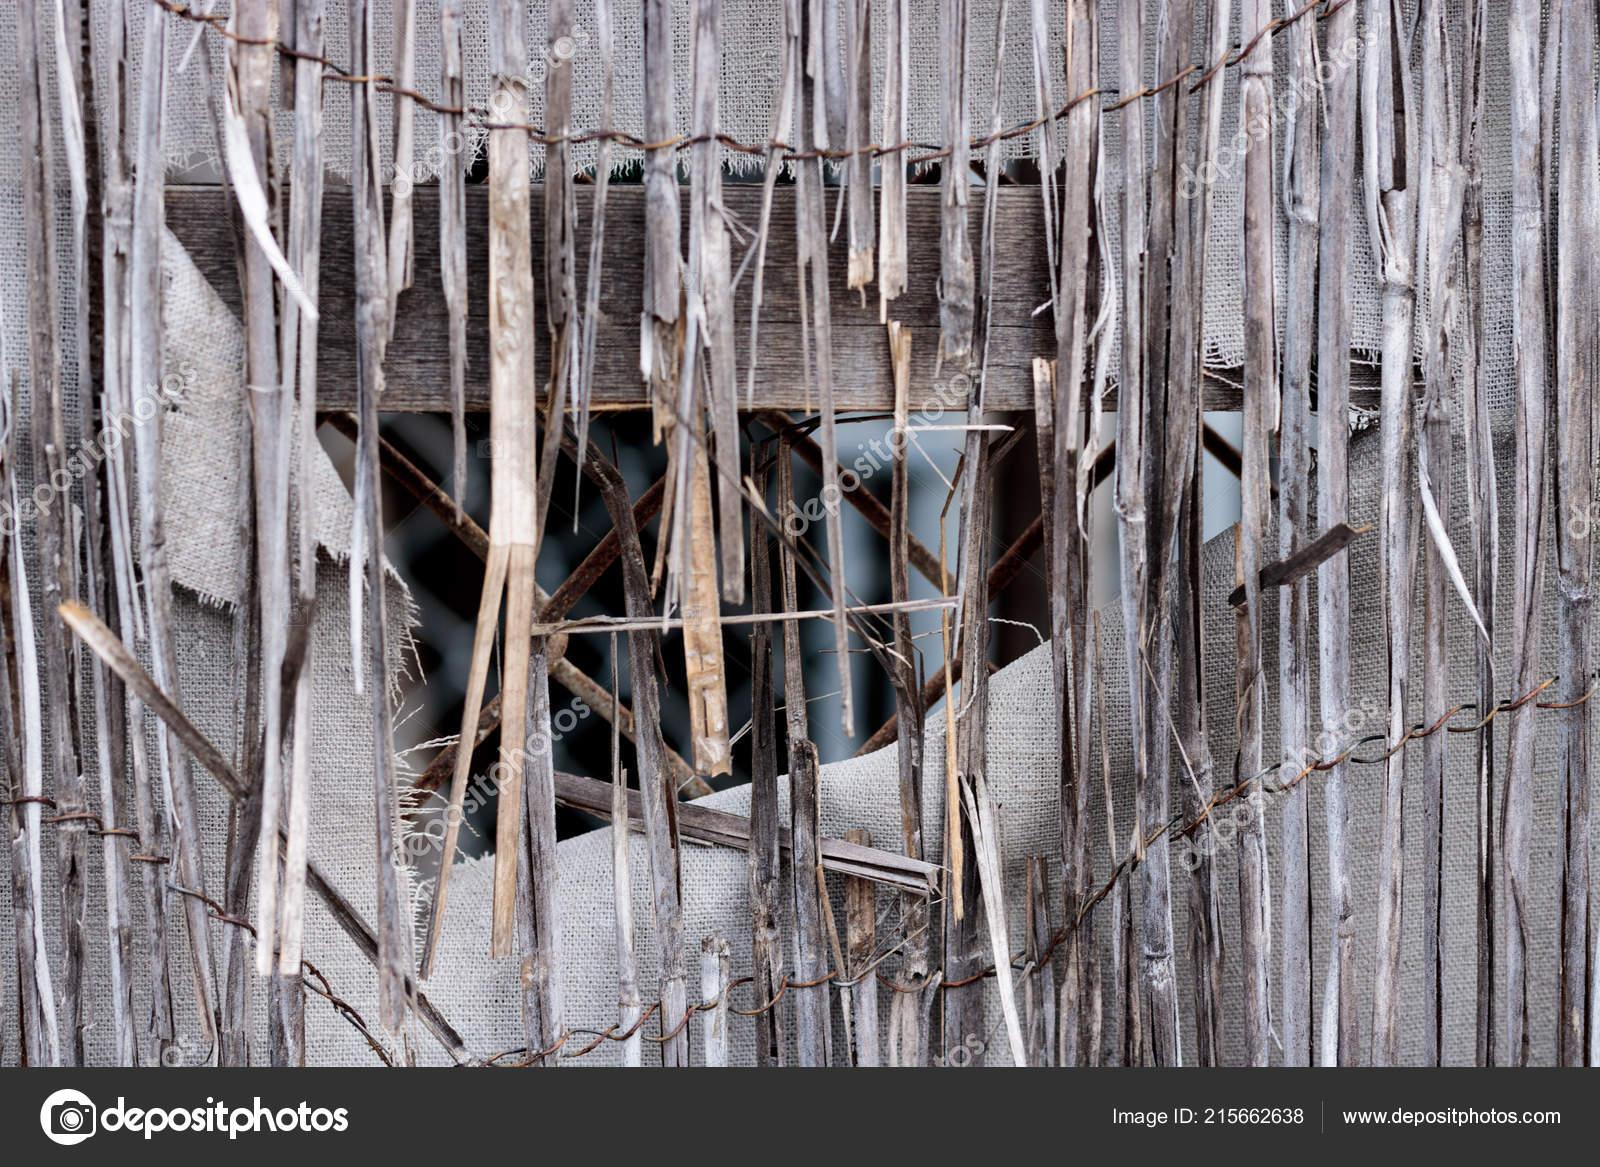 Vintage Bamboo Rattan Close Dilapidated Retro Worn Fence Held